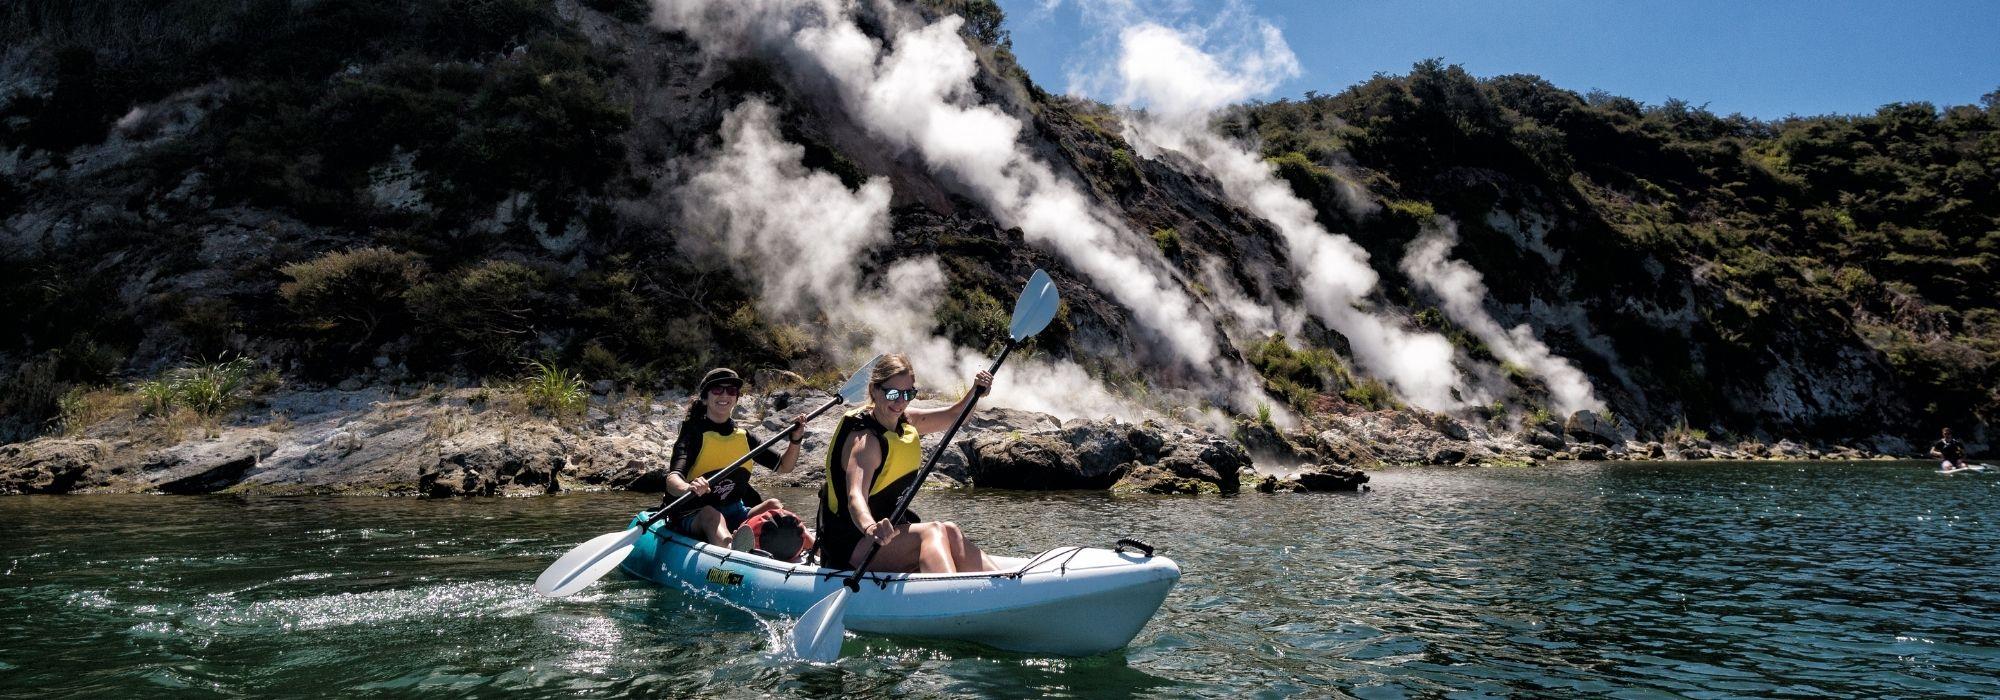 Head outdoors to feel fresh and invigorated in Rotorua